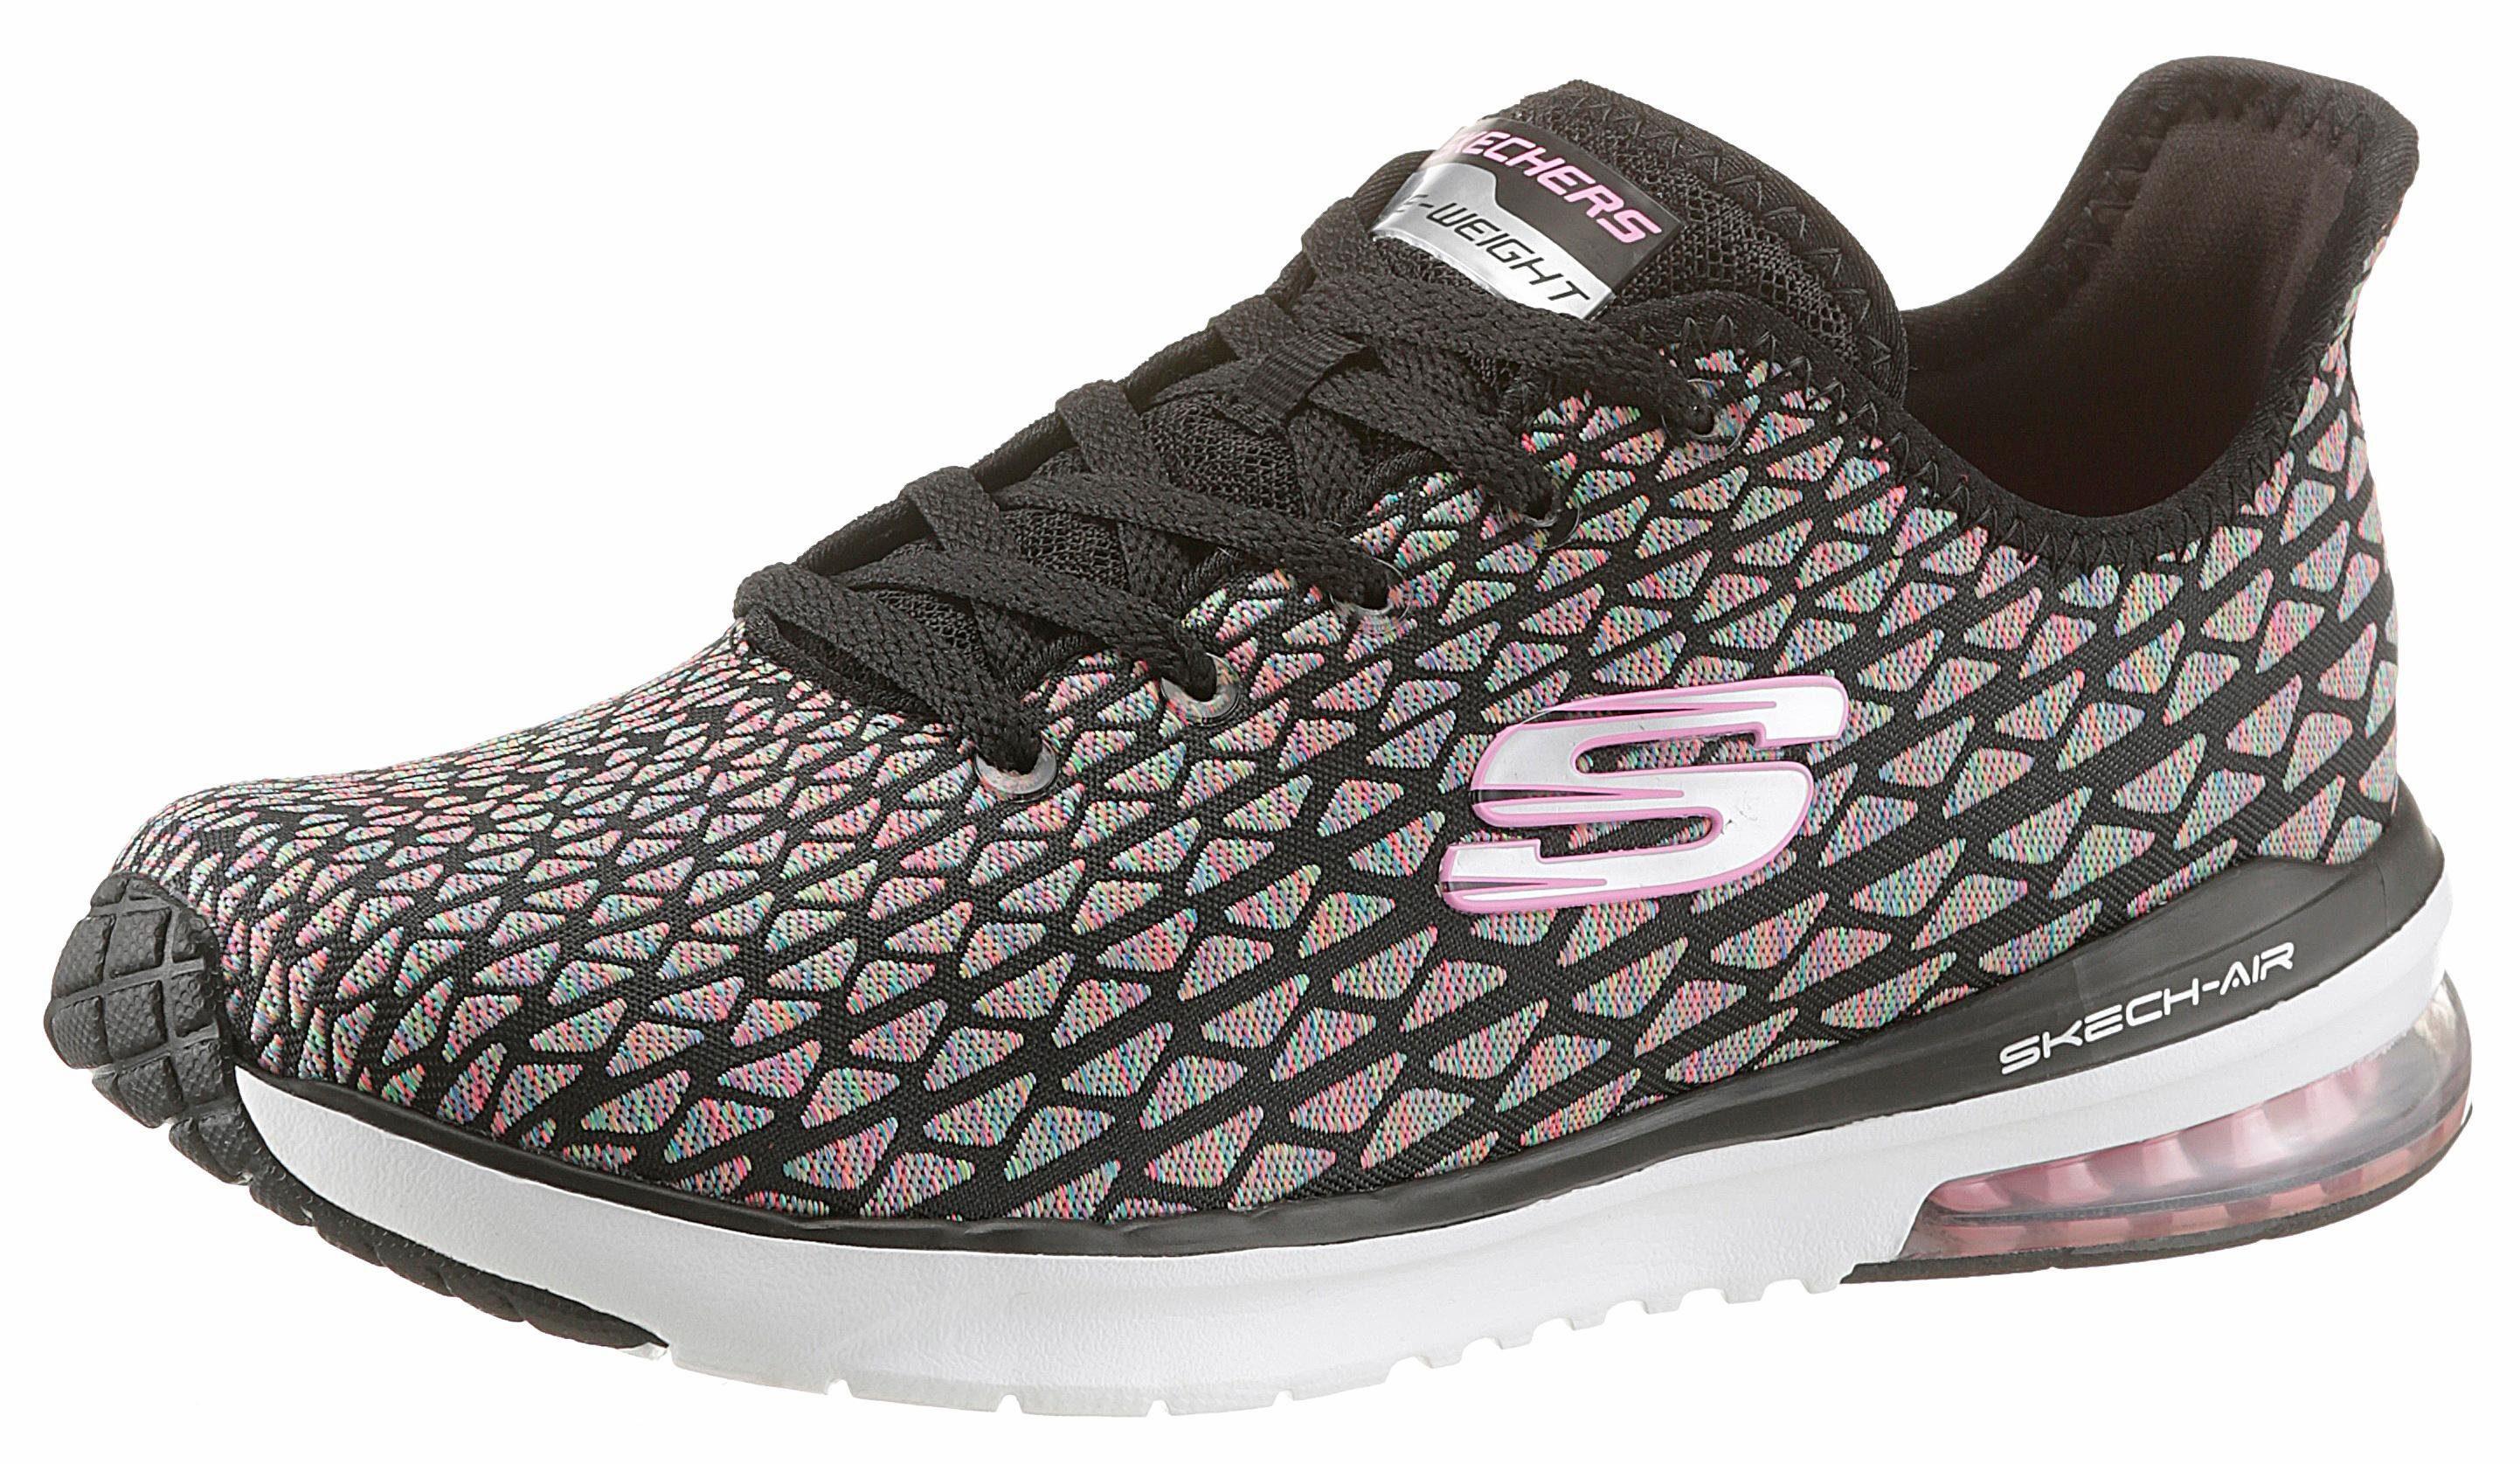 Skechers »Skech-Air Infinity Free Fallin« Sneaker, mit auffälligem Muster, blau, 35 35